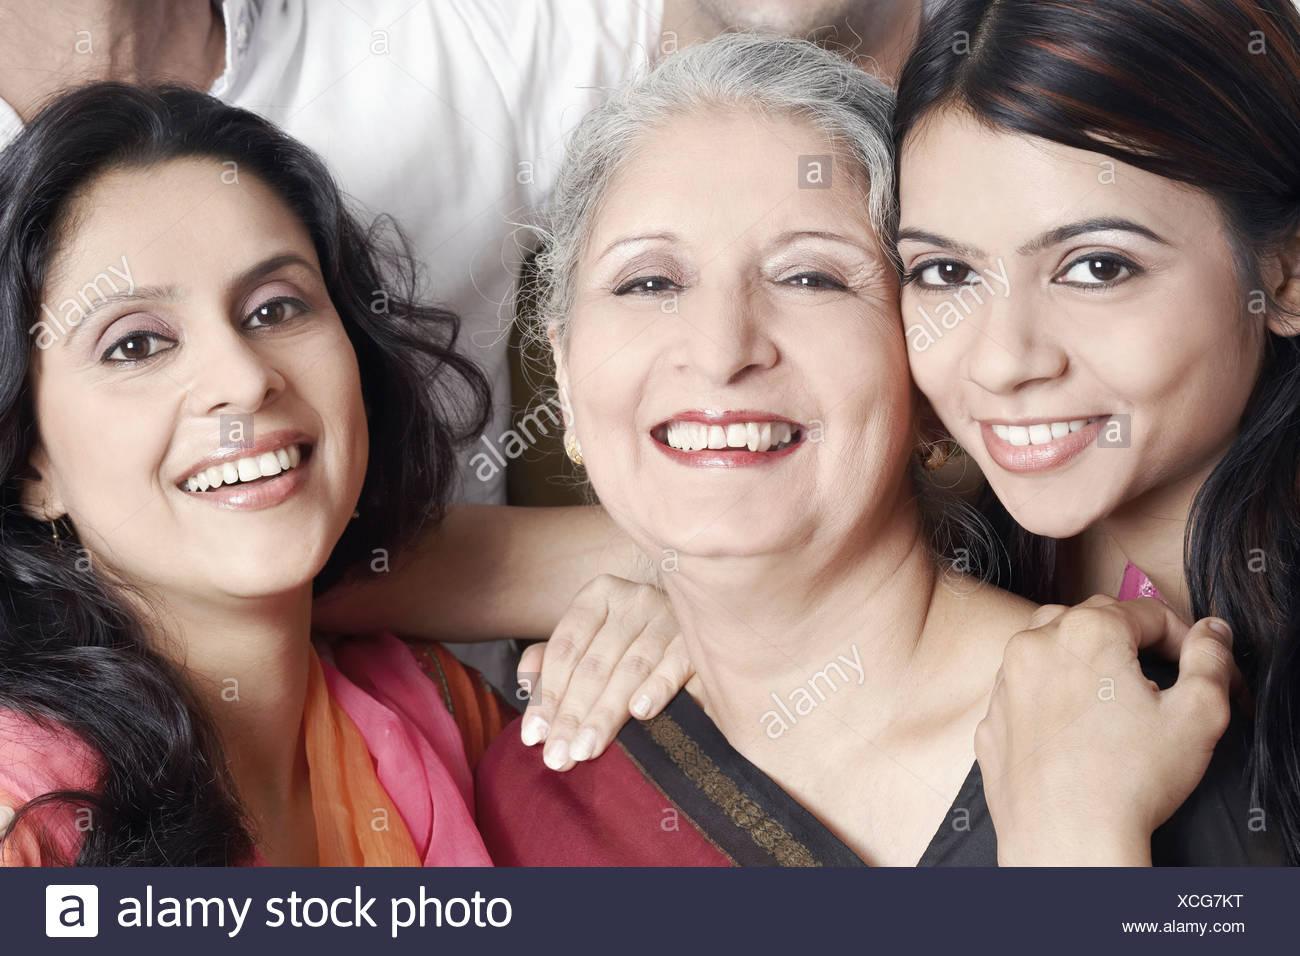 Portrait of three women smiling - Stock Image